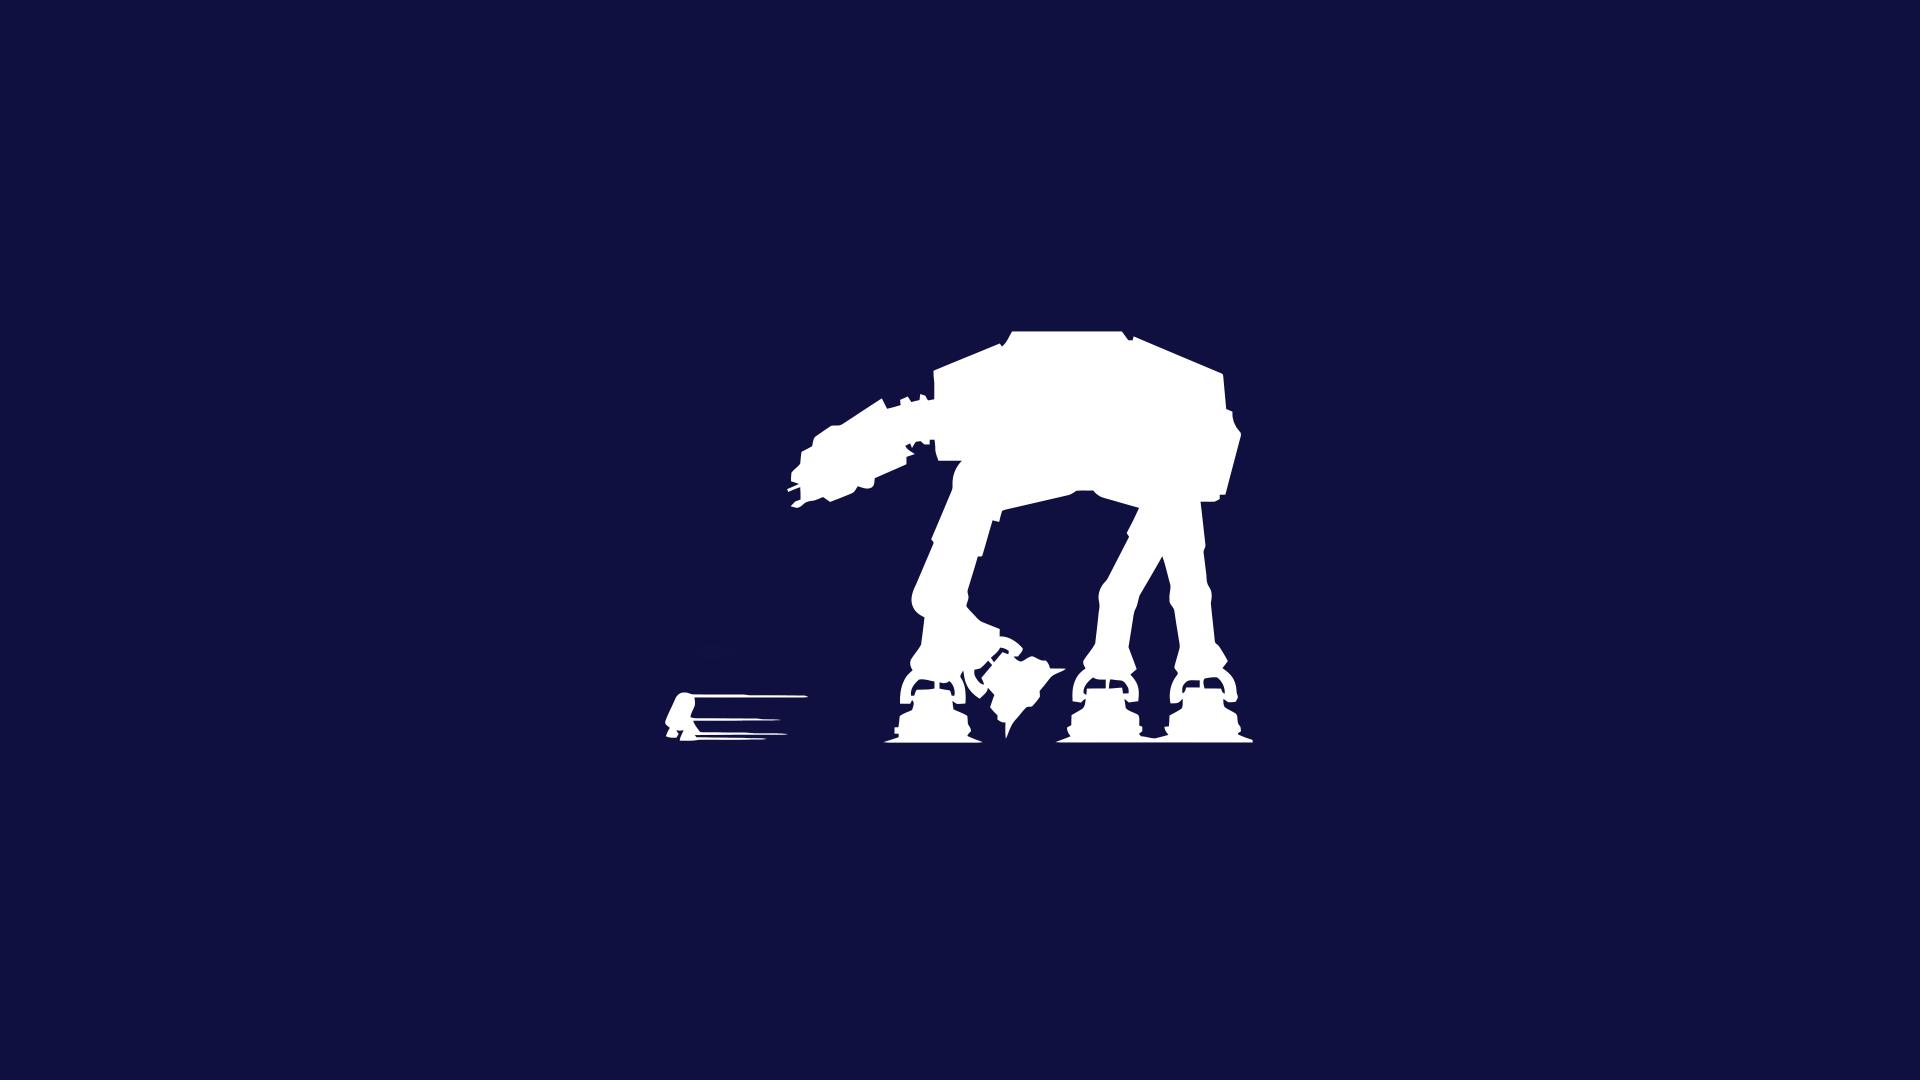 Funny Star Wars Wallpapers Sf Wallpaper